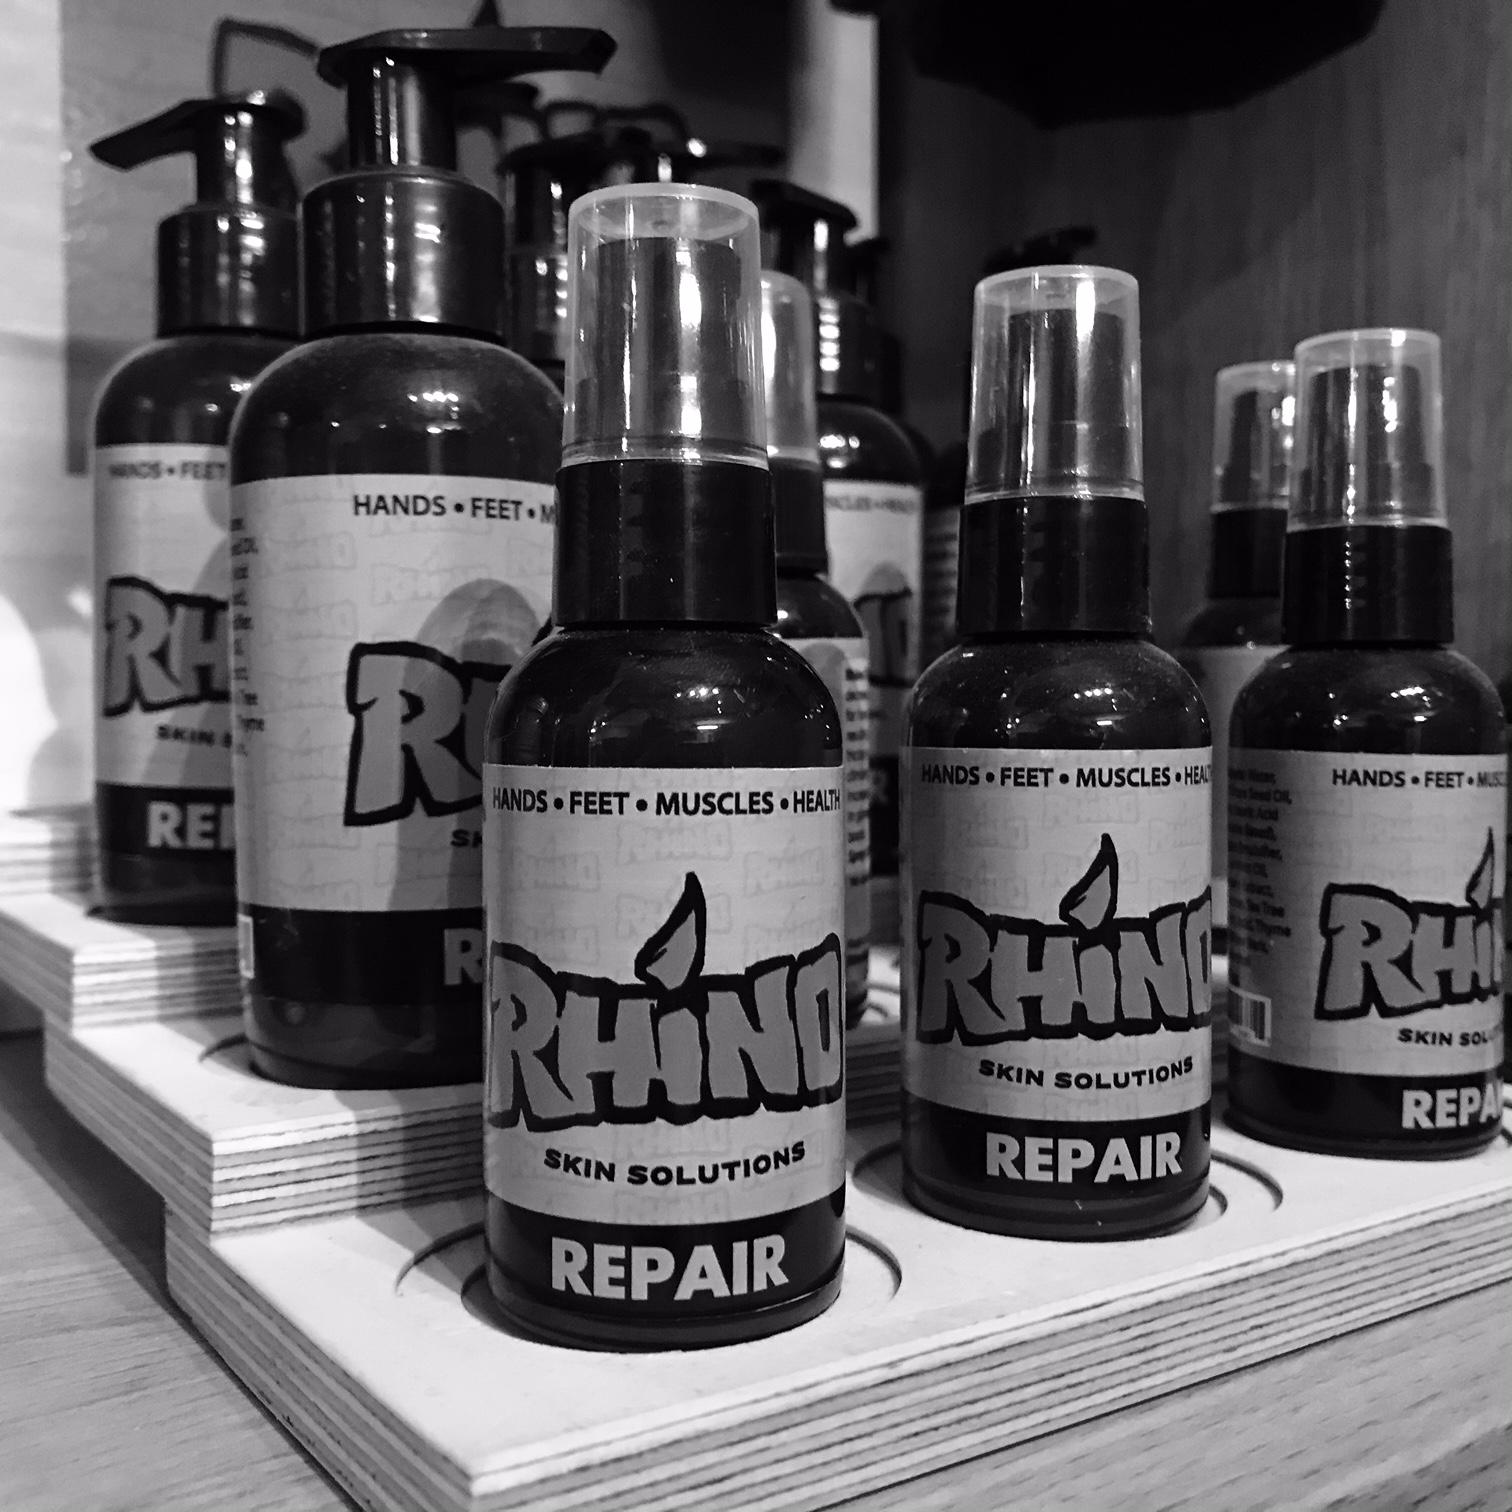 Rhino Skin Solutions Repair Cream